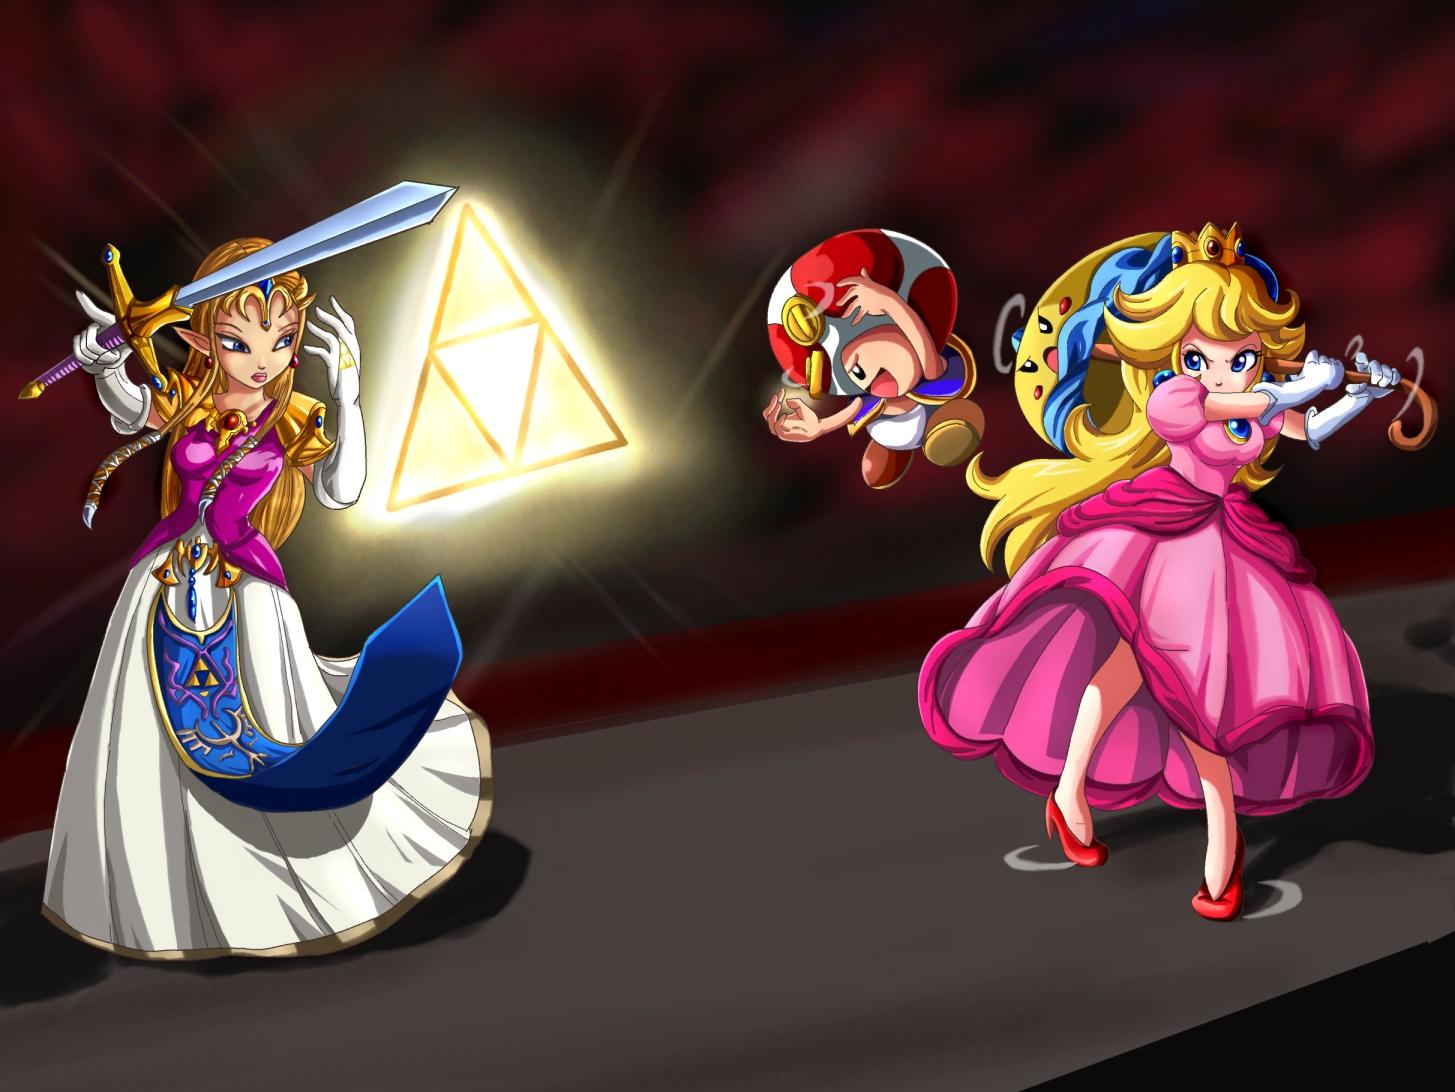 [jeu] Association d'idees en image - Page 6 Zelda_vs_Princess_Peach_by_SigurdHosenfeld